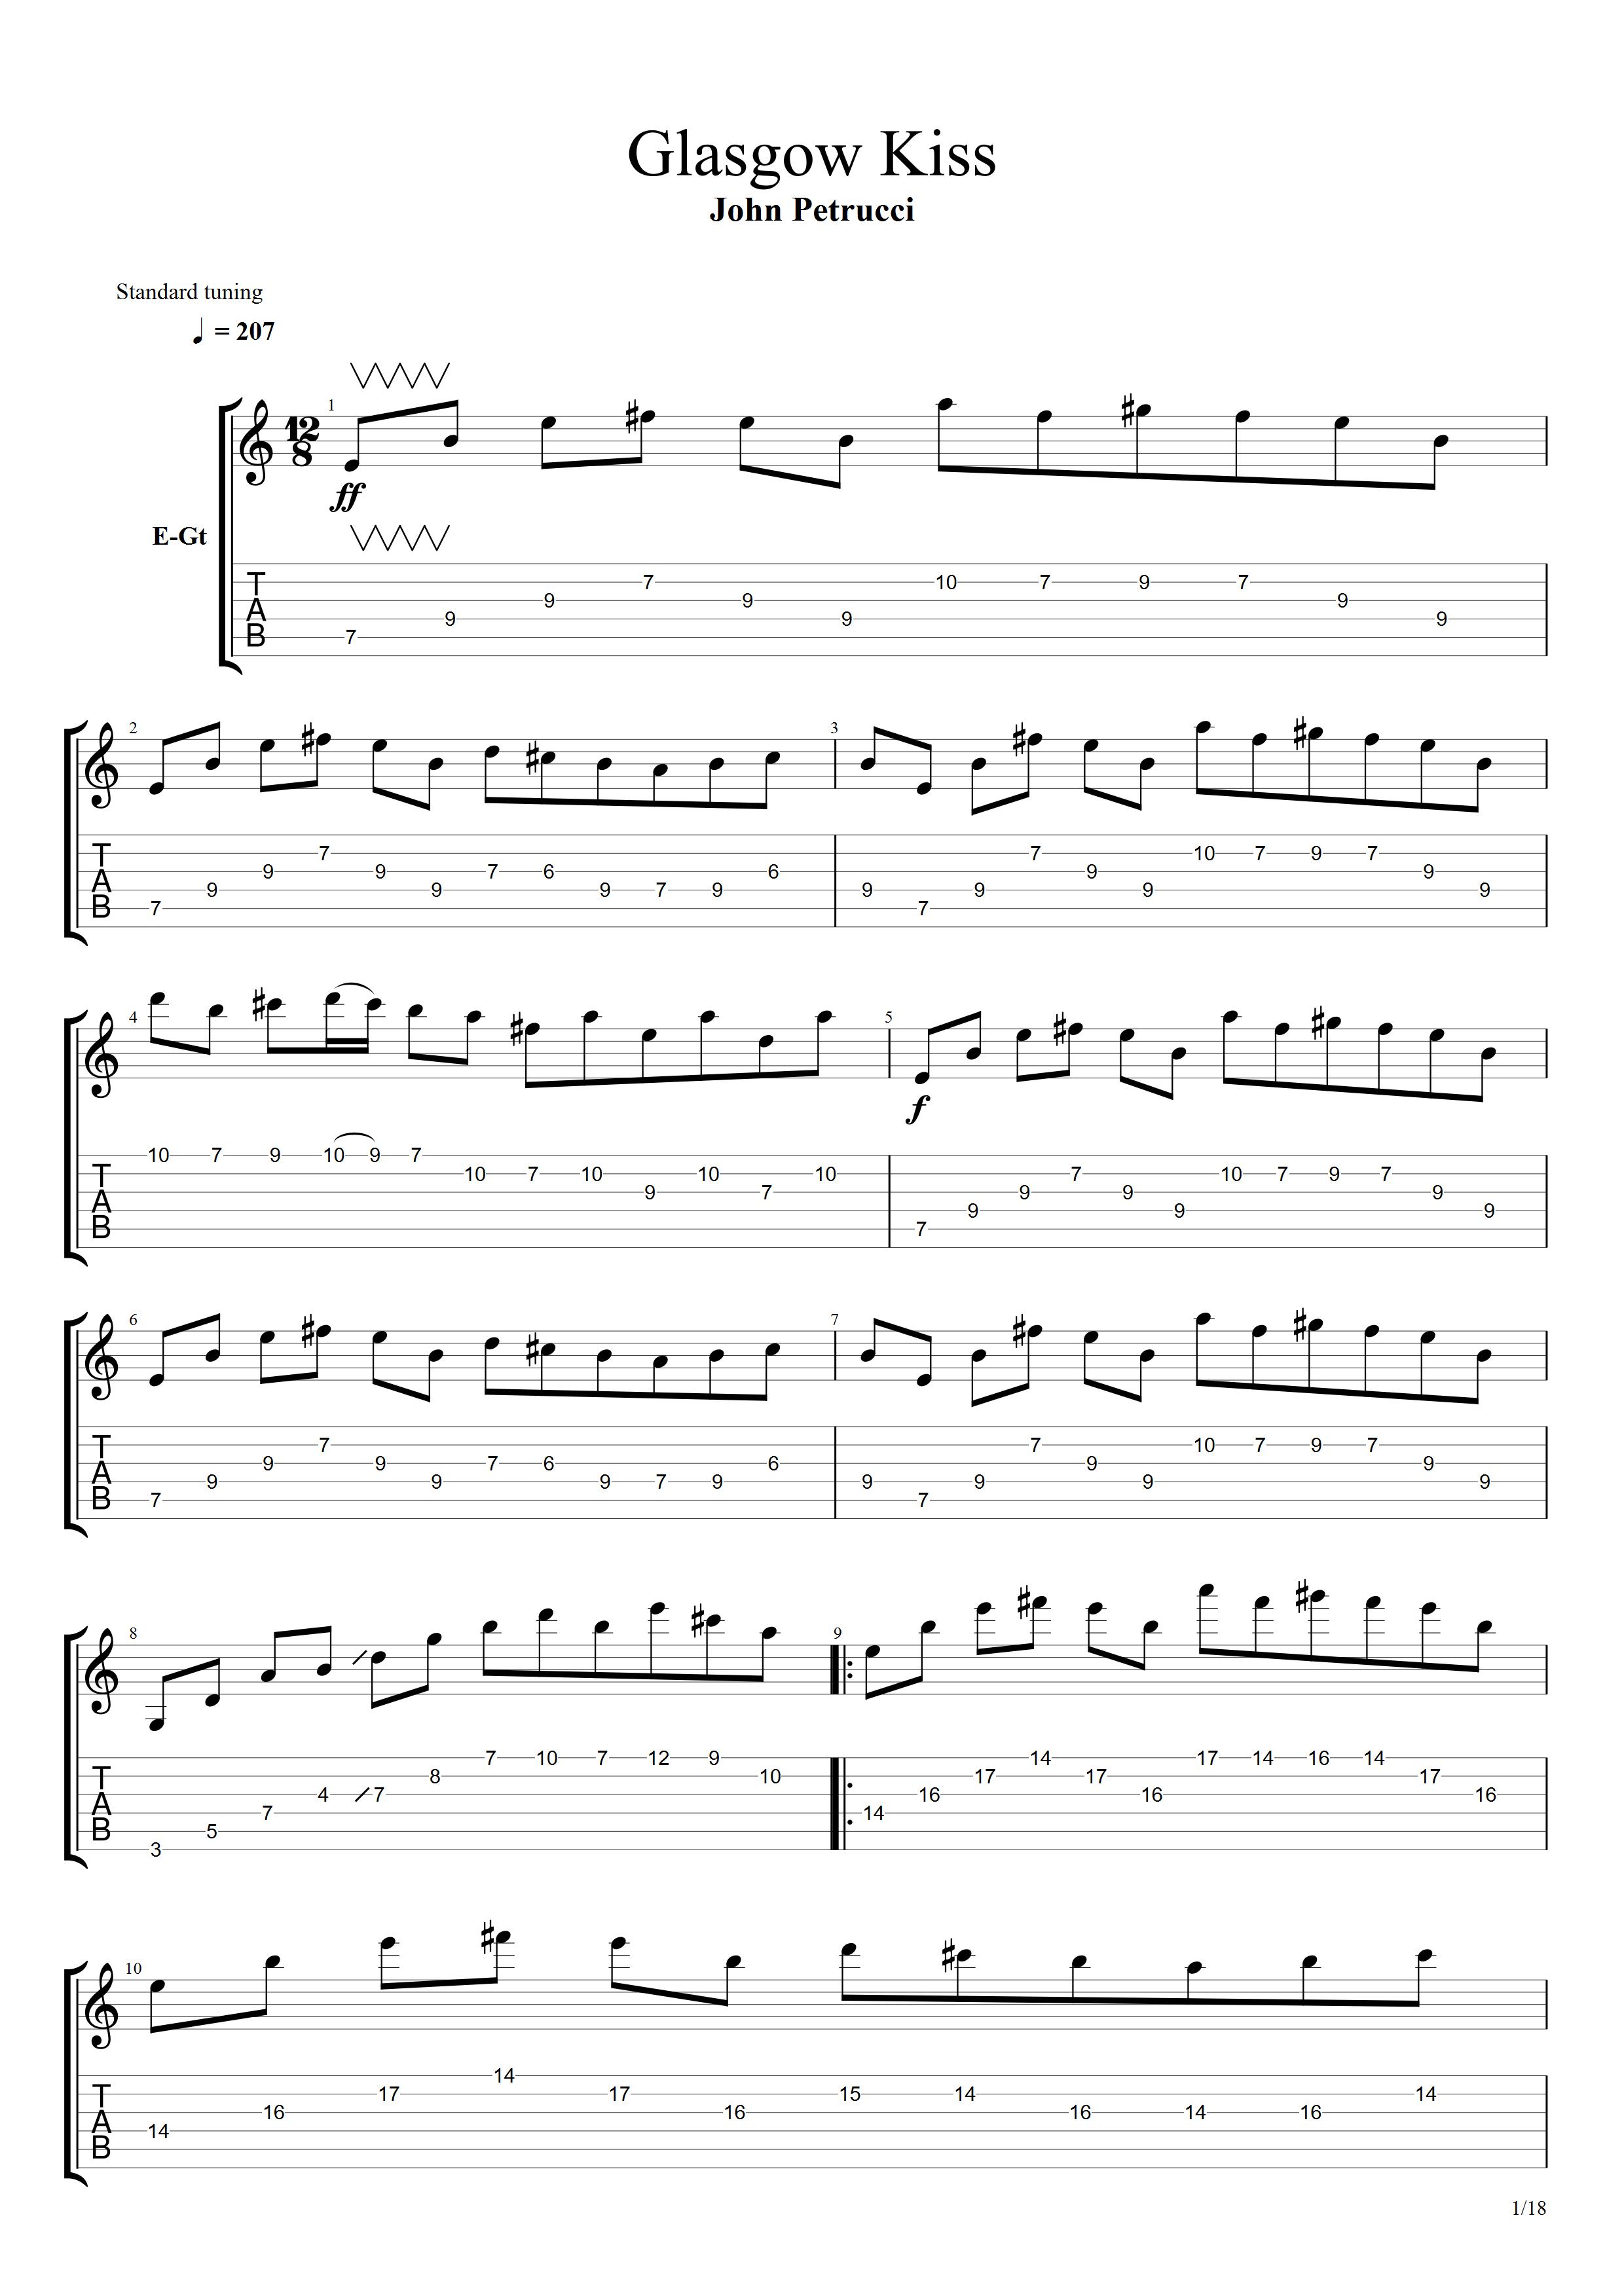 John_Petrucci_-_Glasgow_Kiss.png